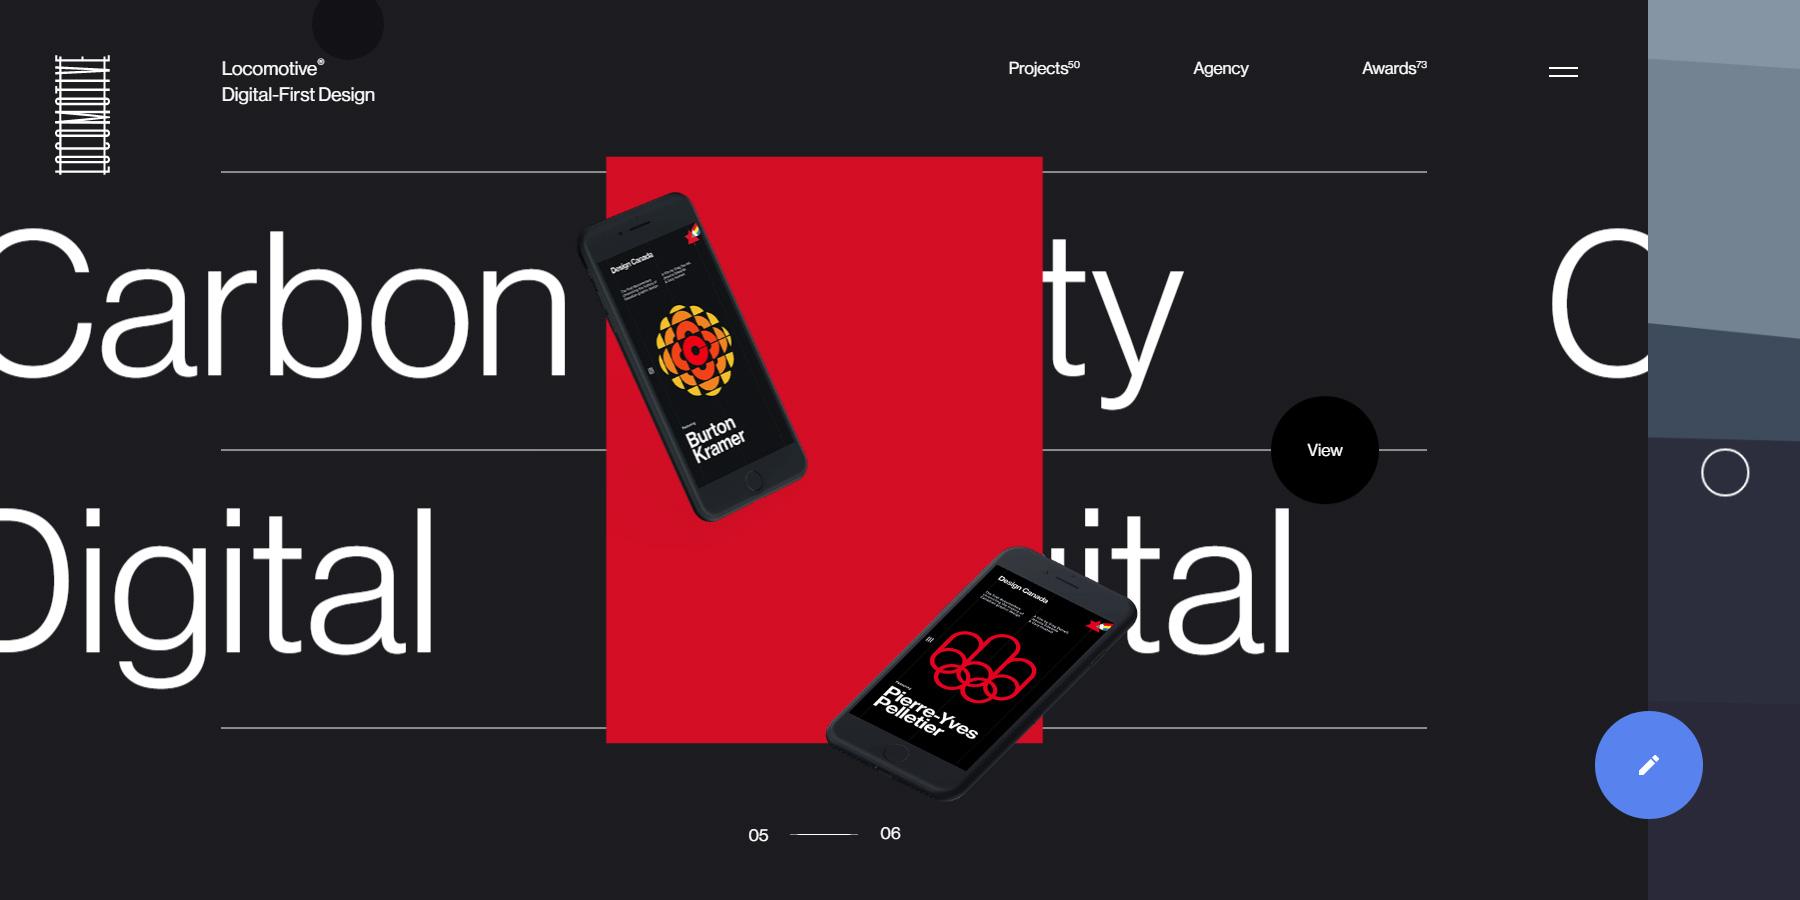 Locomotive - Website of the Month